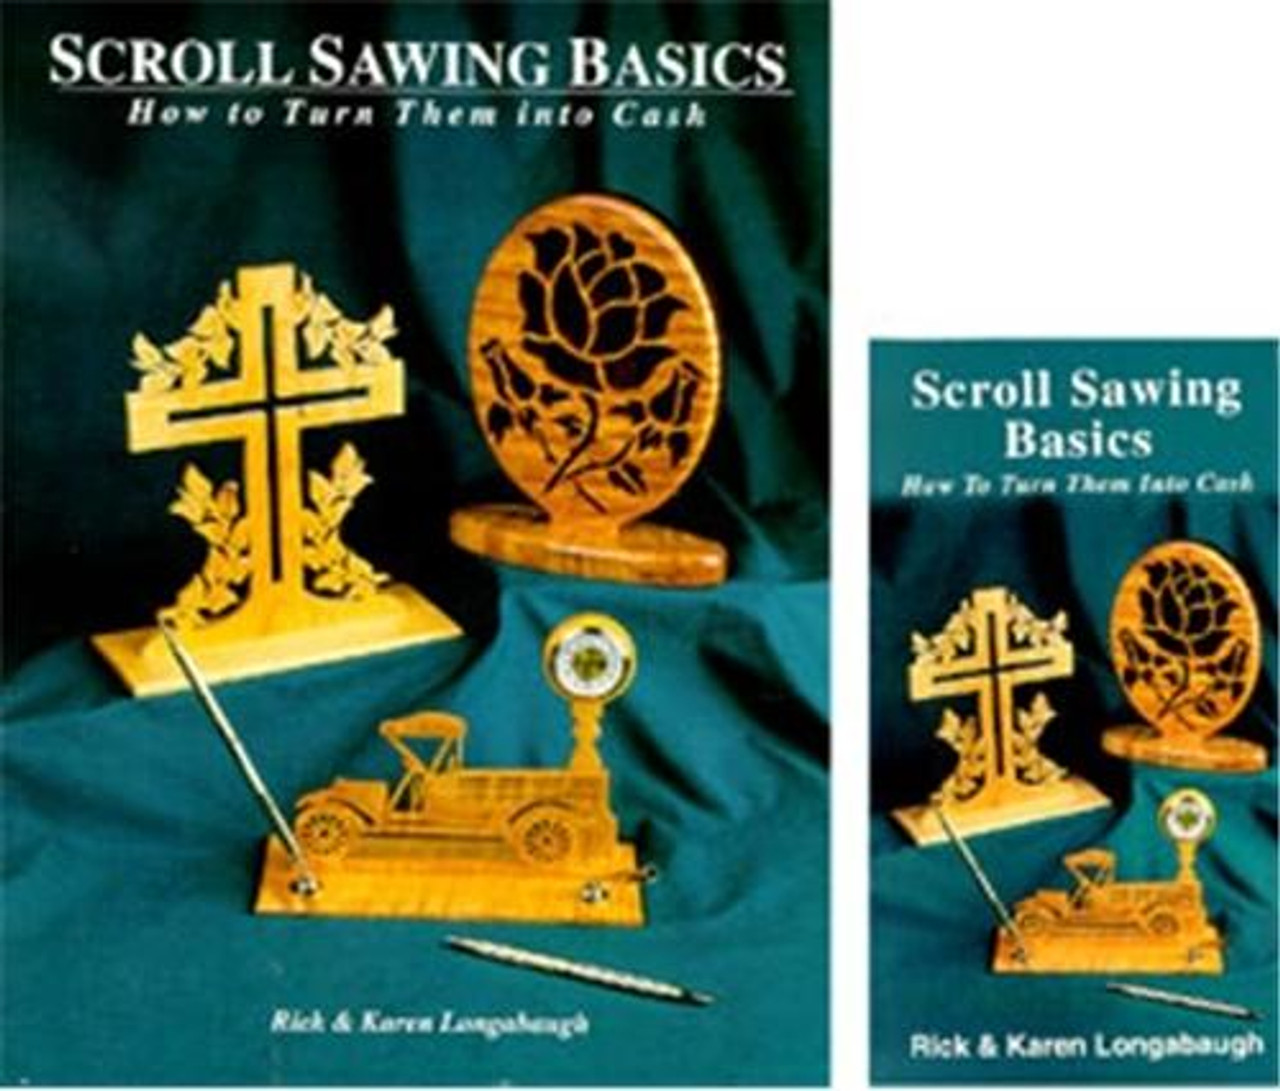 Scroll Sawing Basics Book